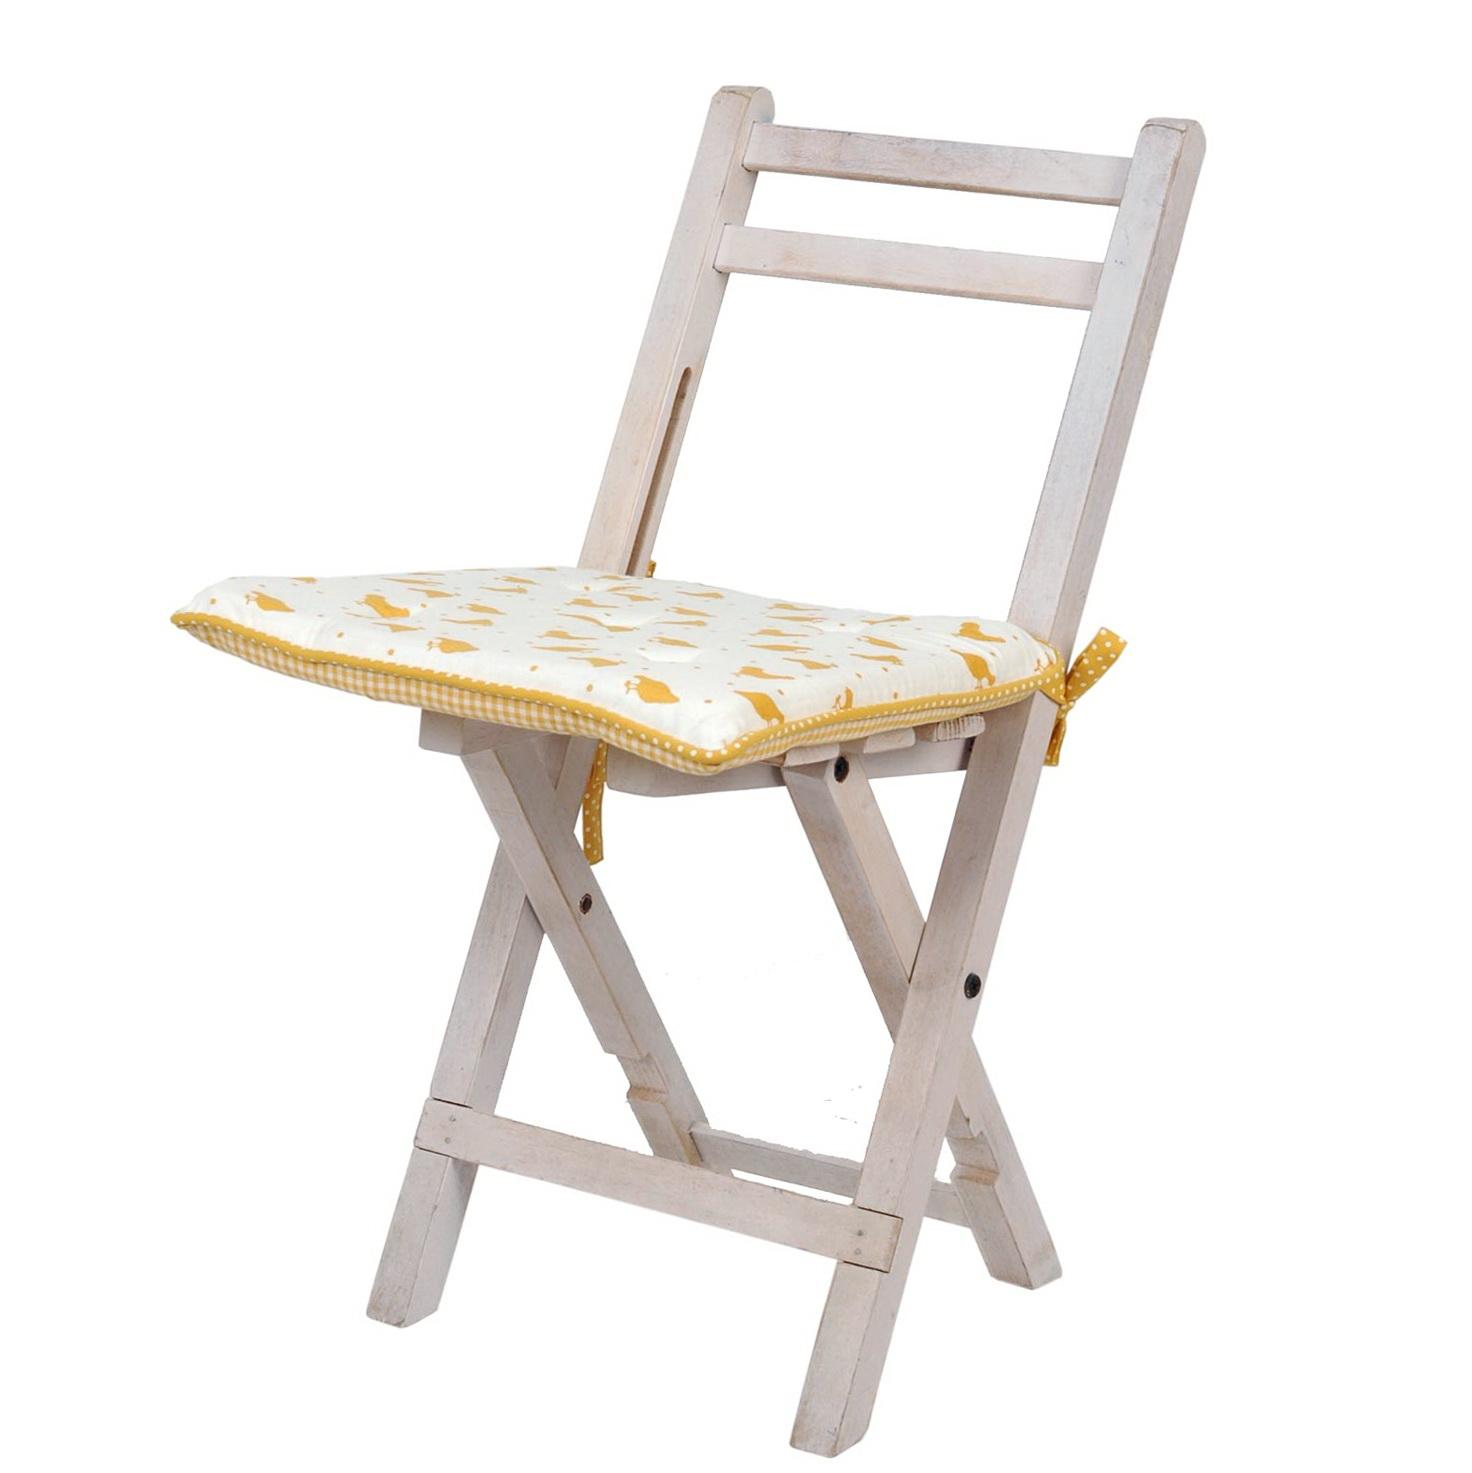 Chair Cushion Foam Replacement